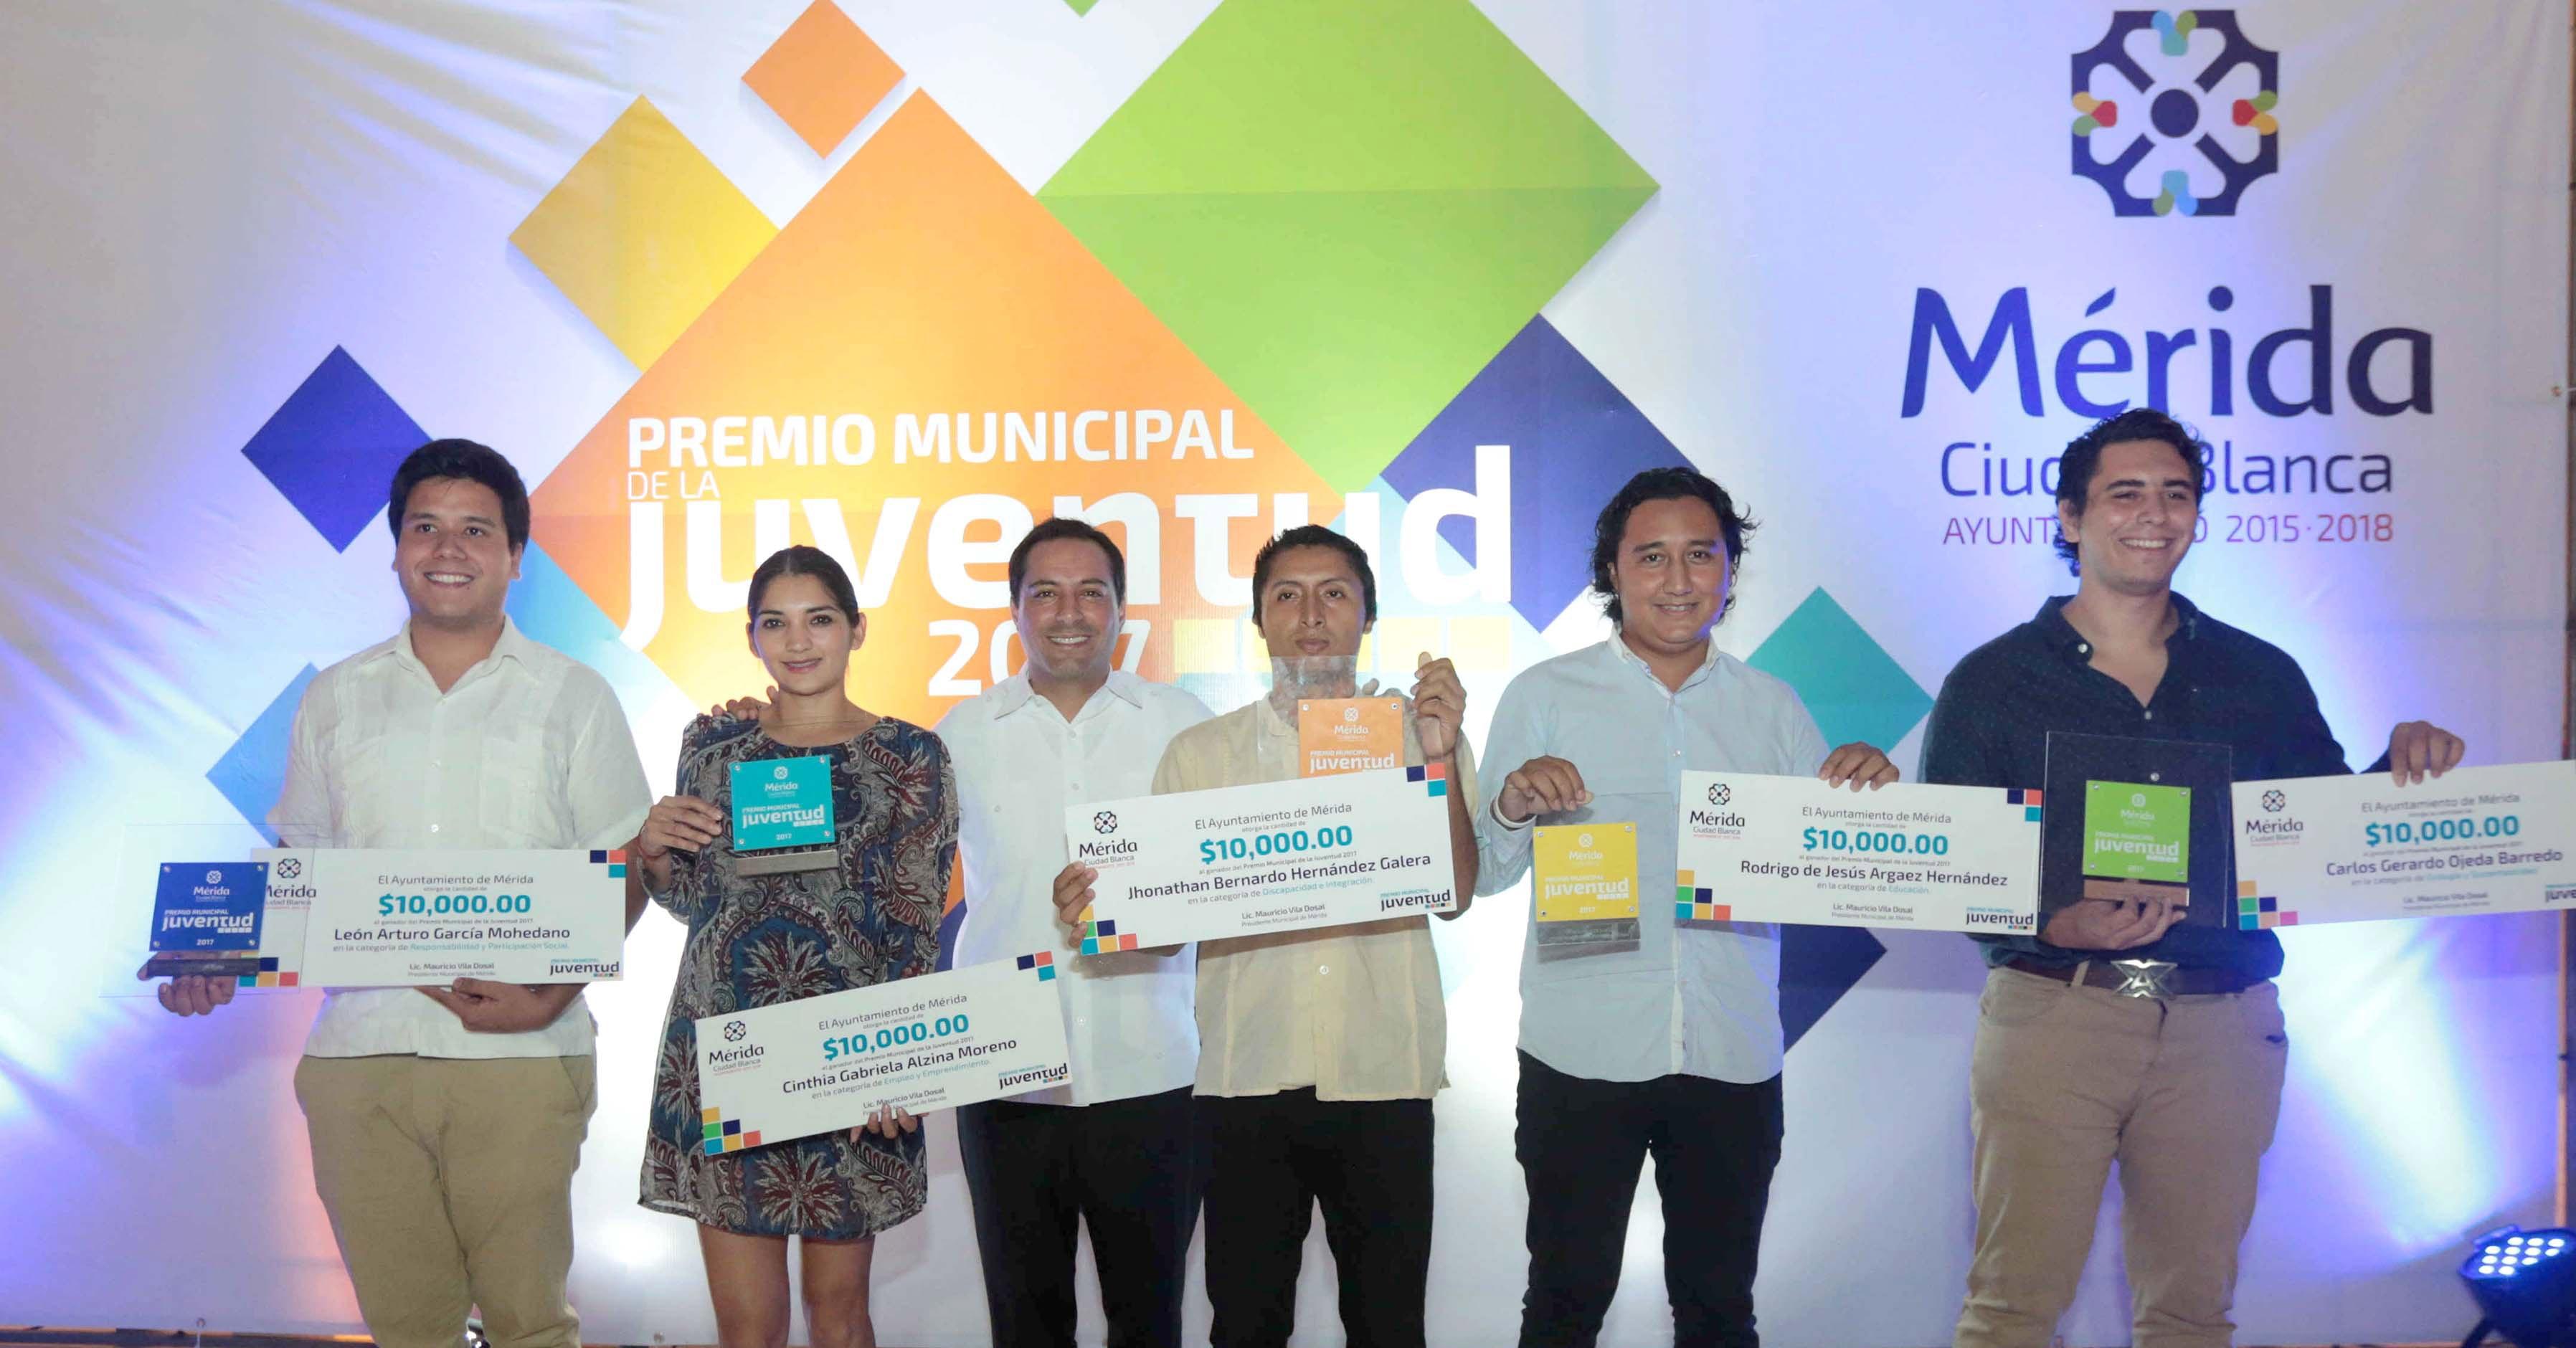 Premio Municipal de la Juventud 2017